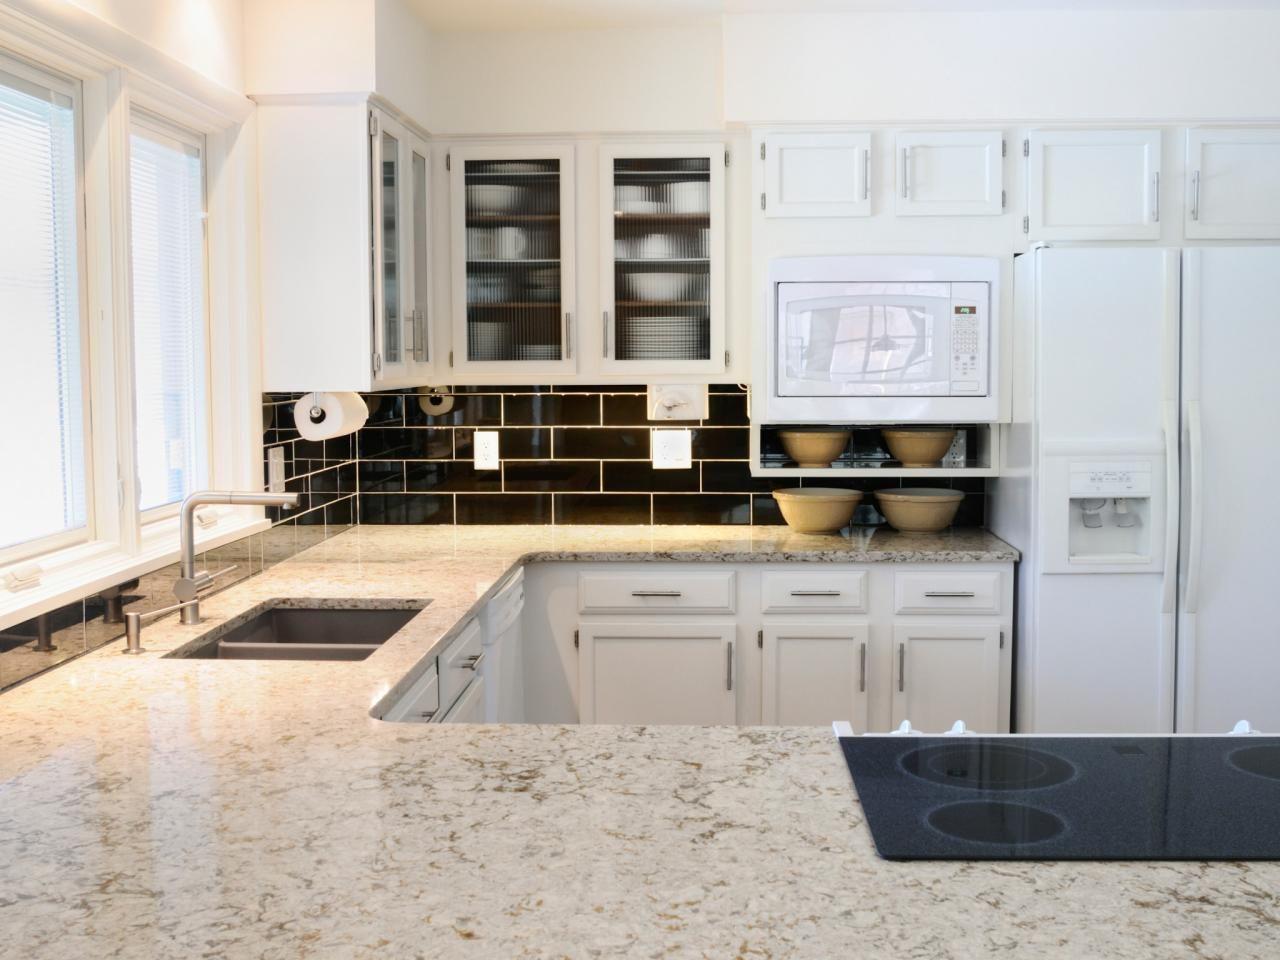 White Granite Kitchen Countertops: Pictures & Ideas From | White ...